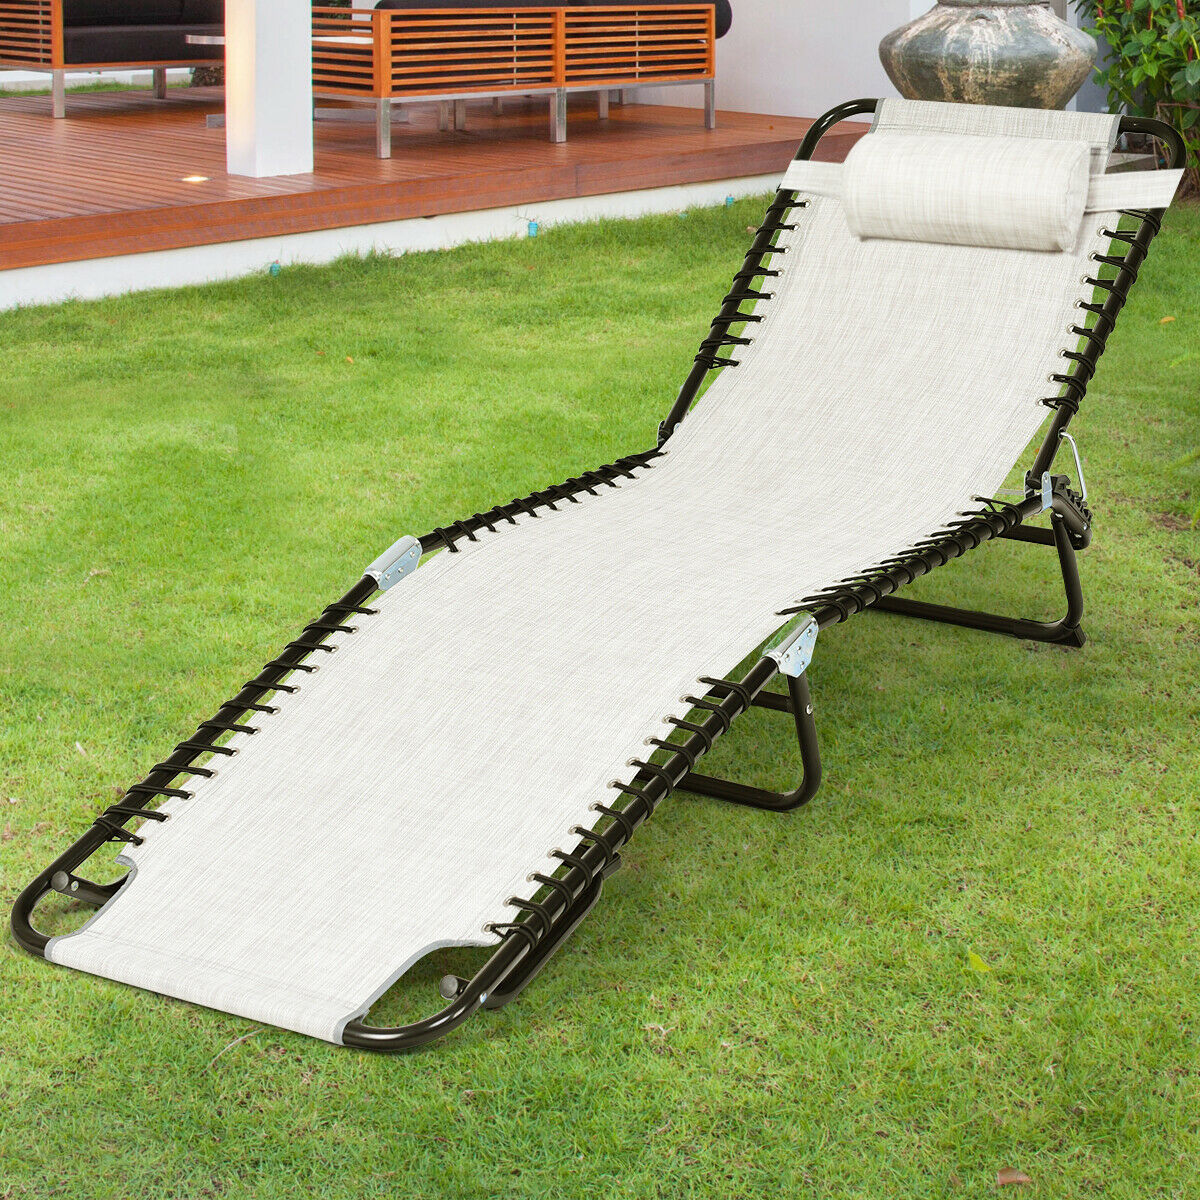 Gymax Foldable Lounge Chaise Adjustable Patio Camping Cot W Pillow Beach Pool Gray Walmart Com Walmart Com